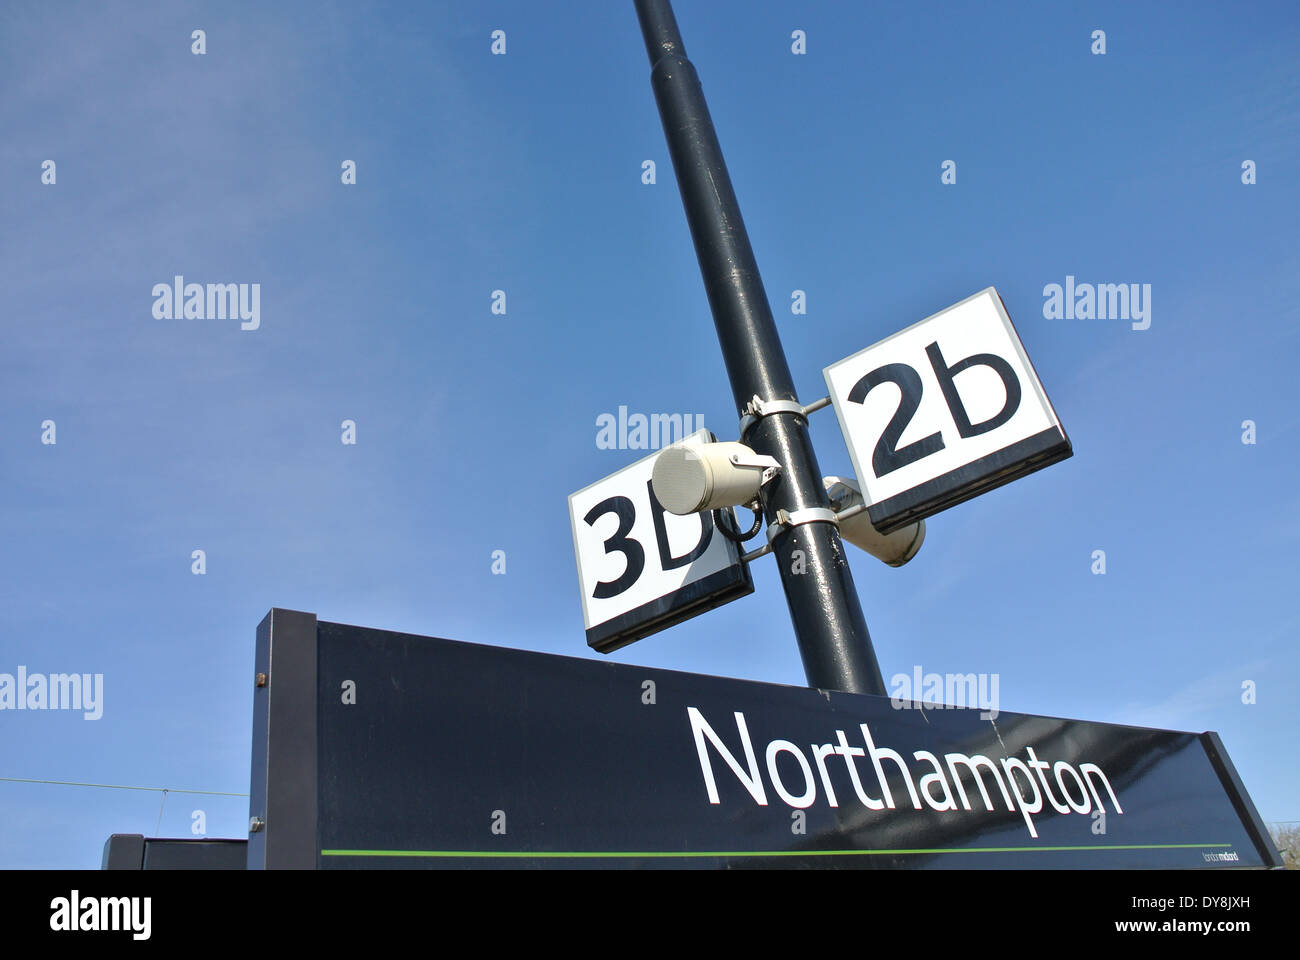 Northampton train railway station - Stock Image